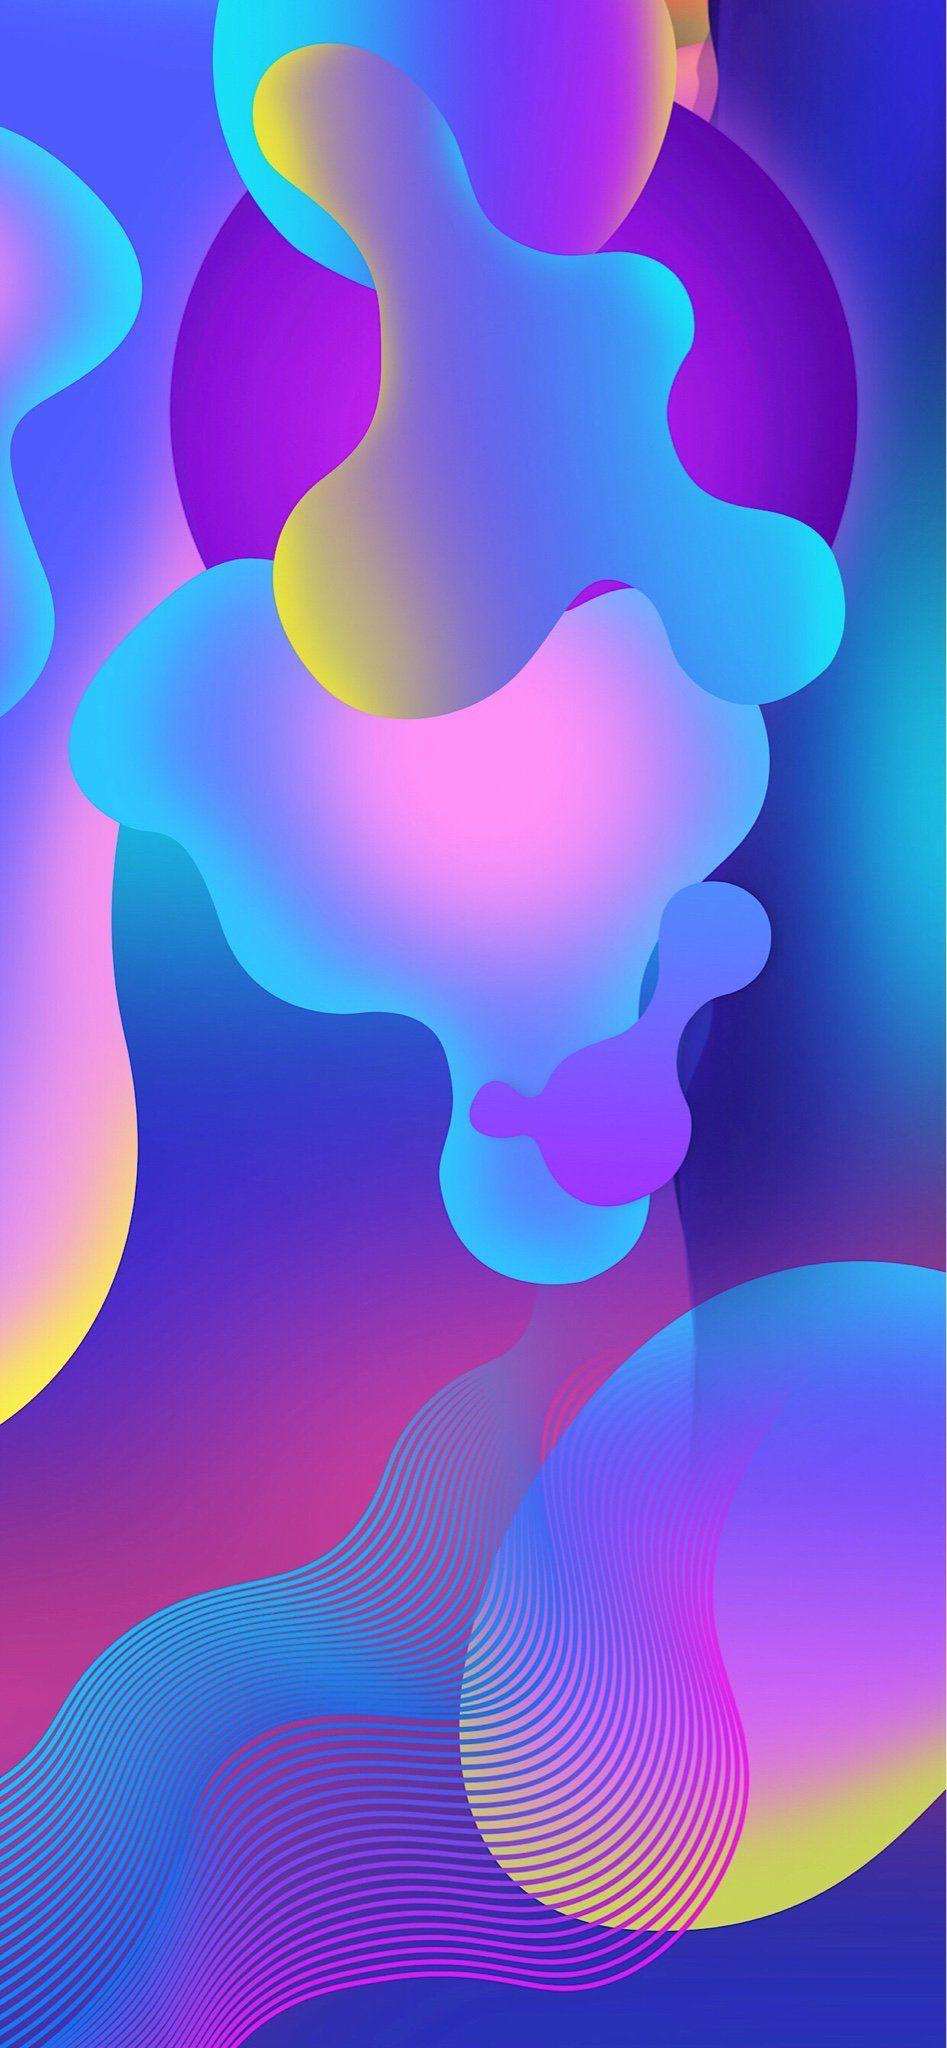 XS Max Wallpapers - Wallpaper Cave